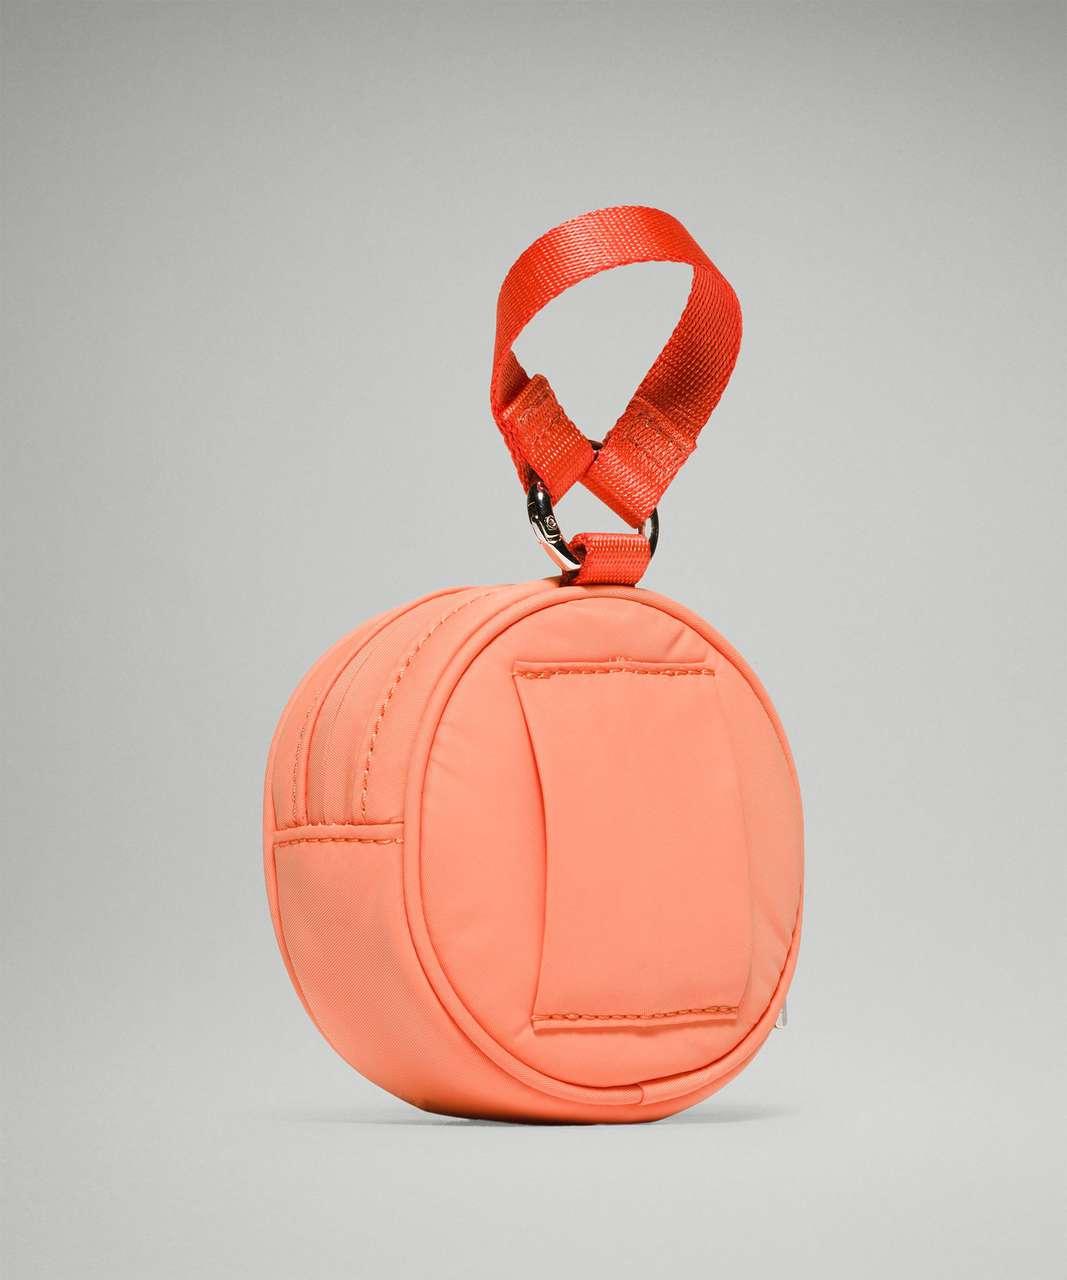 Lululemon Logo Coin Pouch - Golden Apricot / Warm Coral